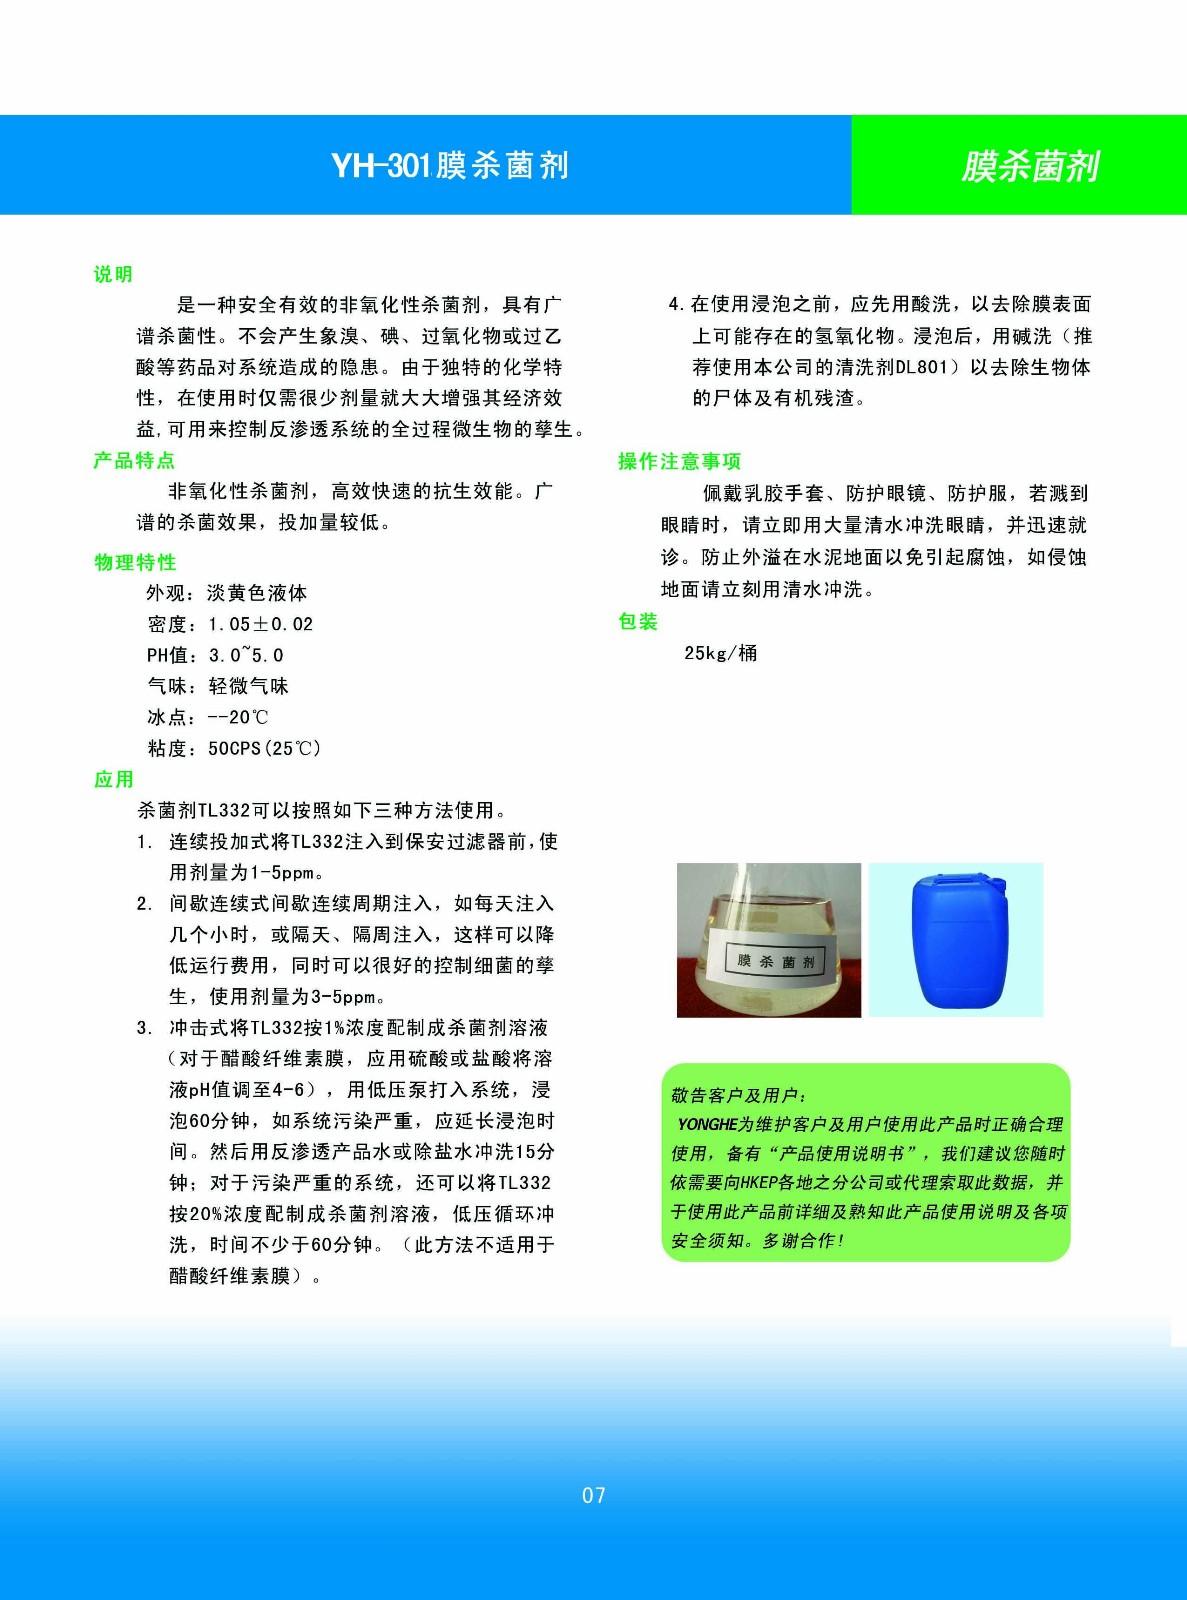 07 YH-301 膜杀菌剂.jpg